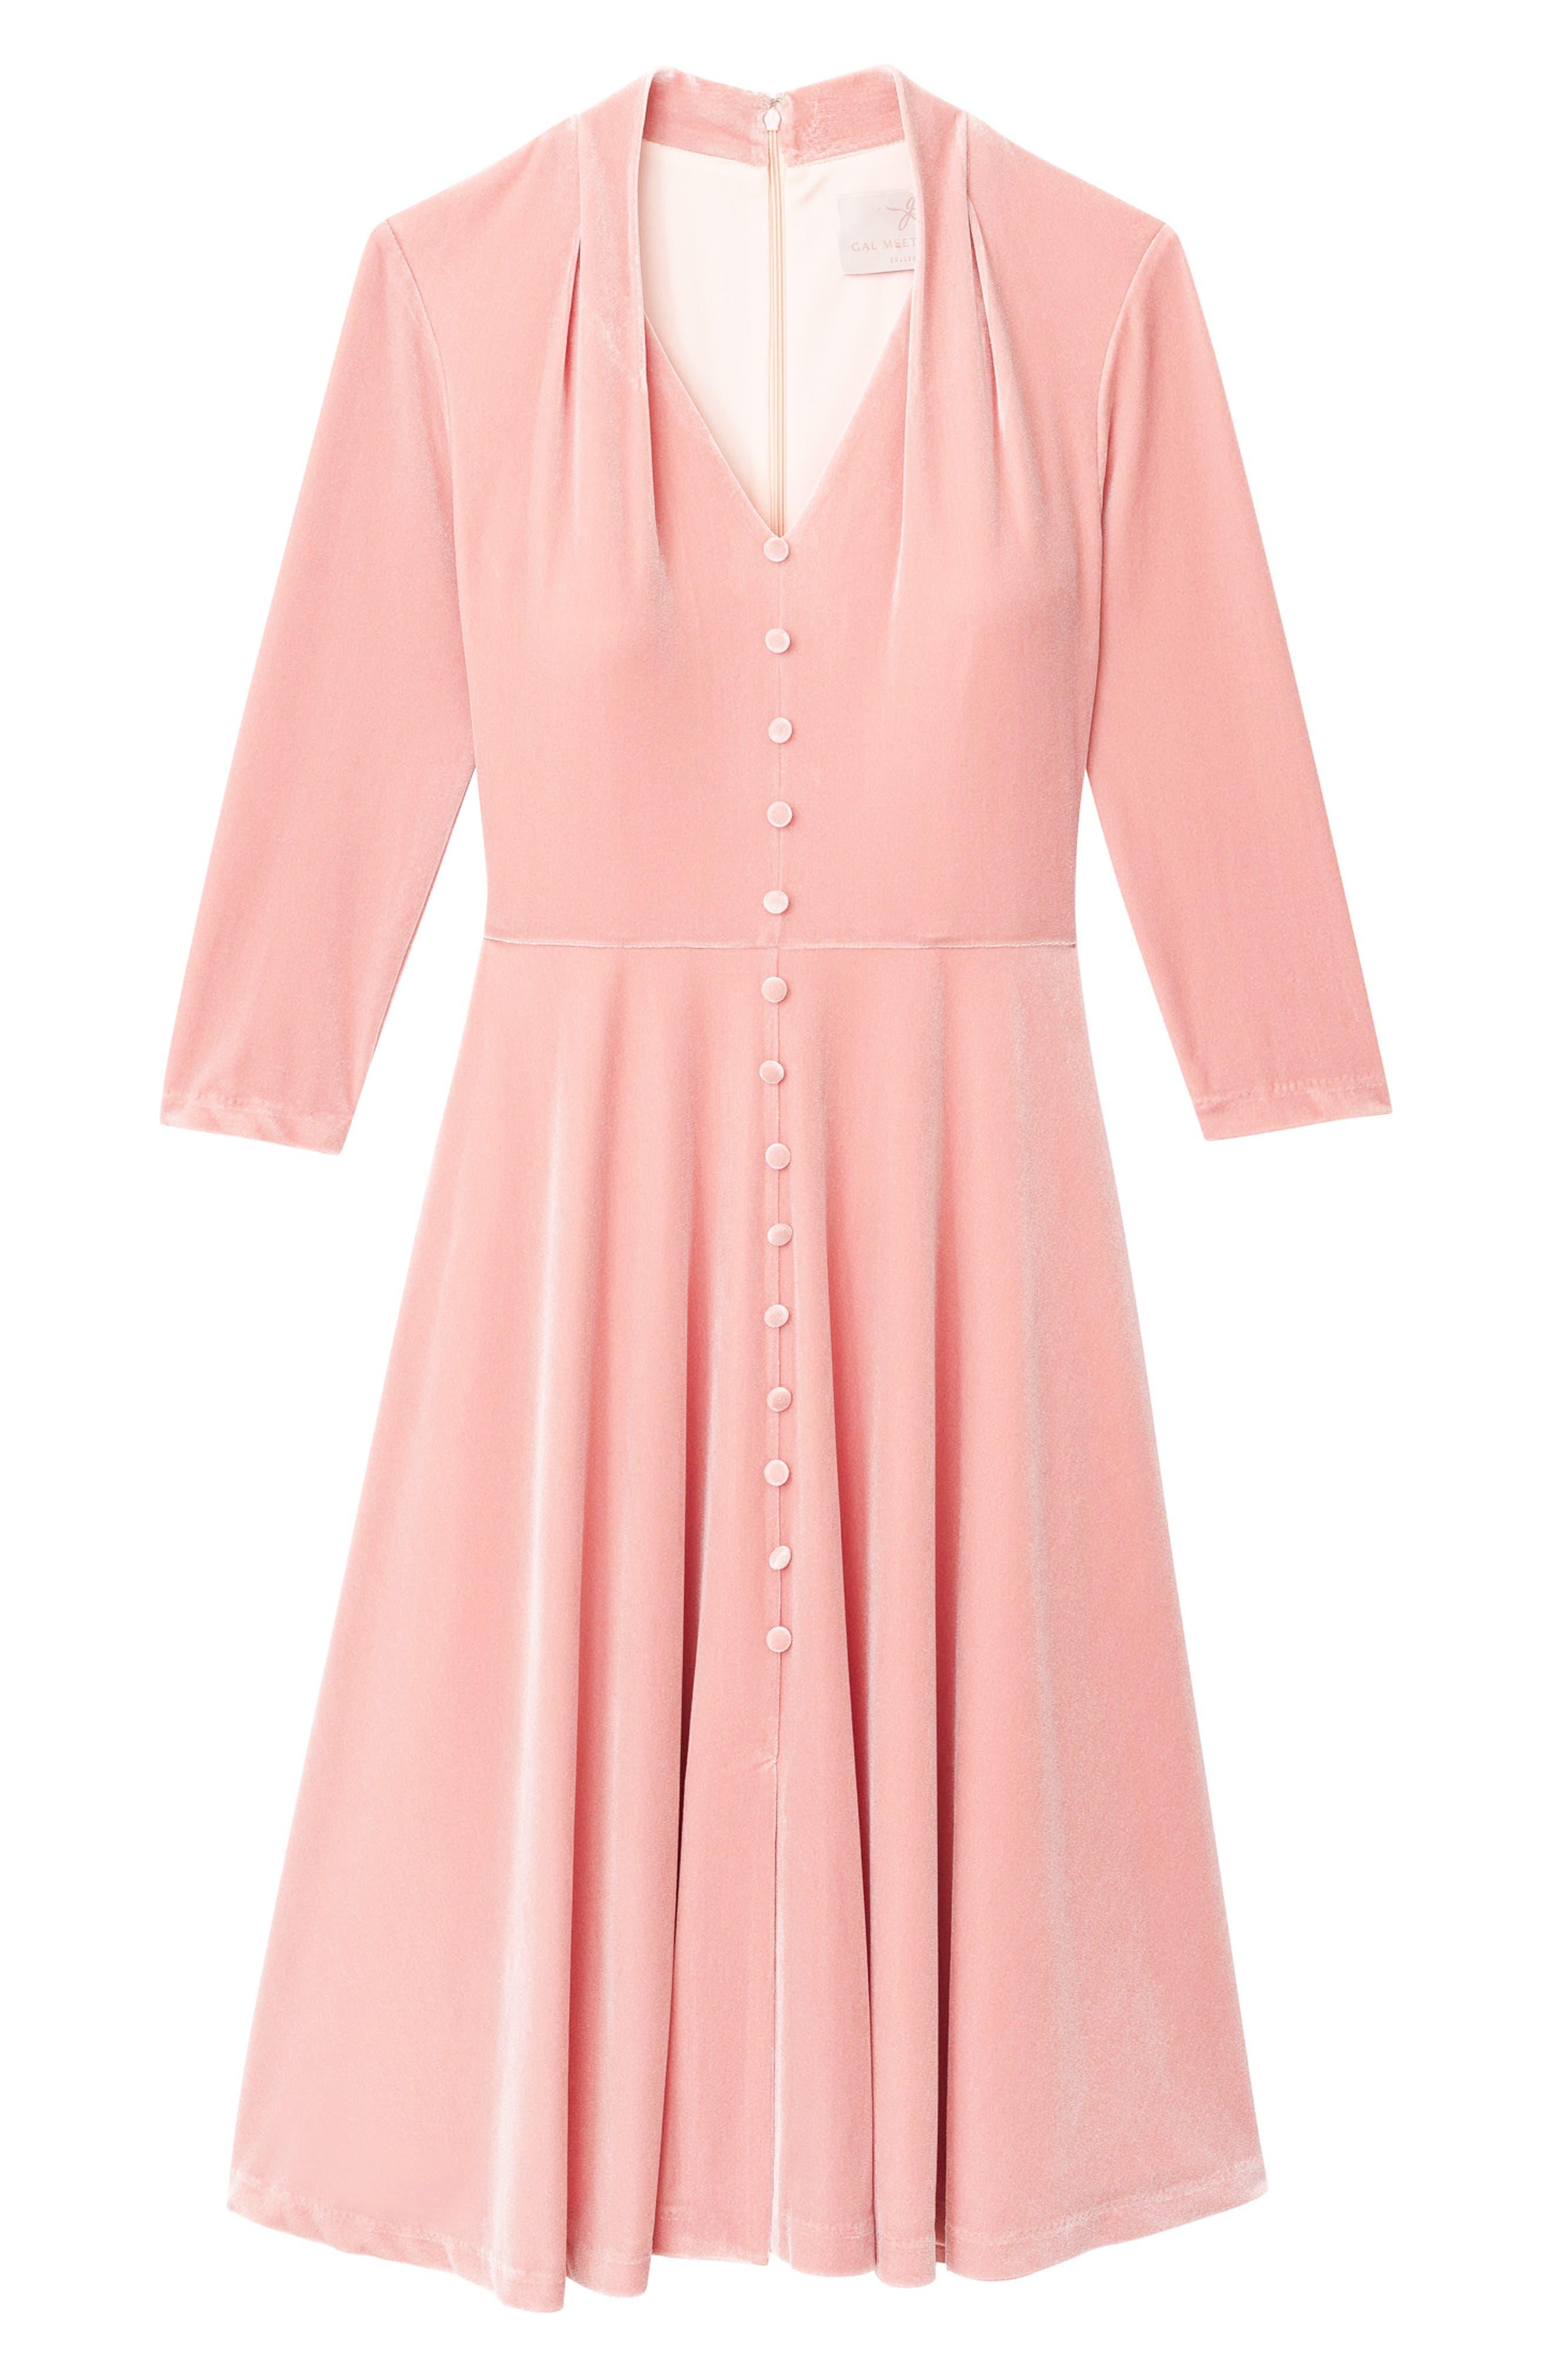 Joy Button Front Velvet Dress,                             Alternate thumbnail 4, color,                             PINK